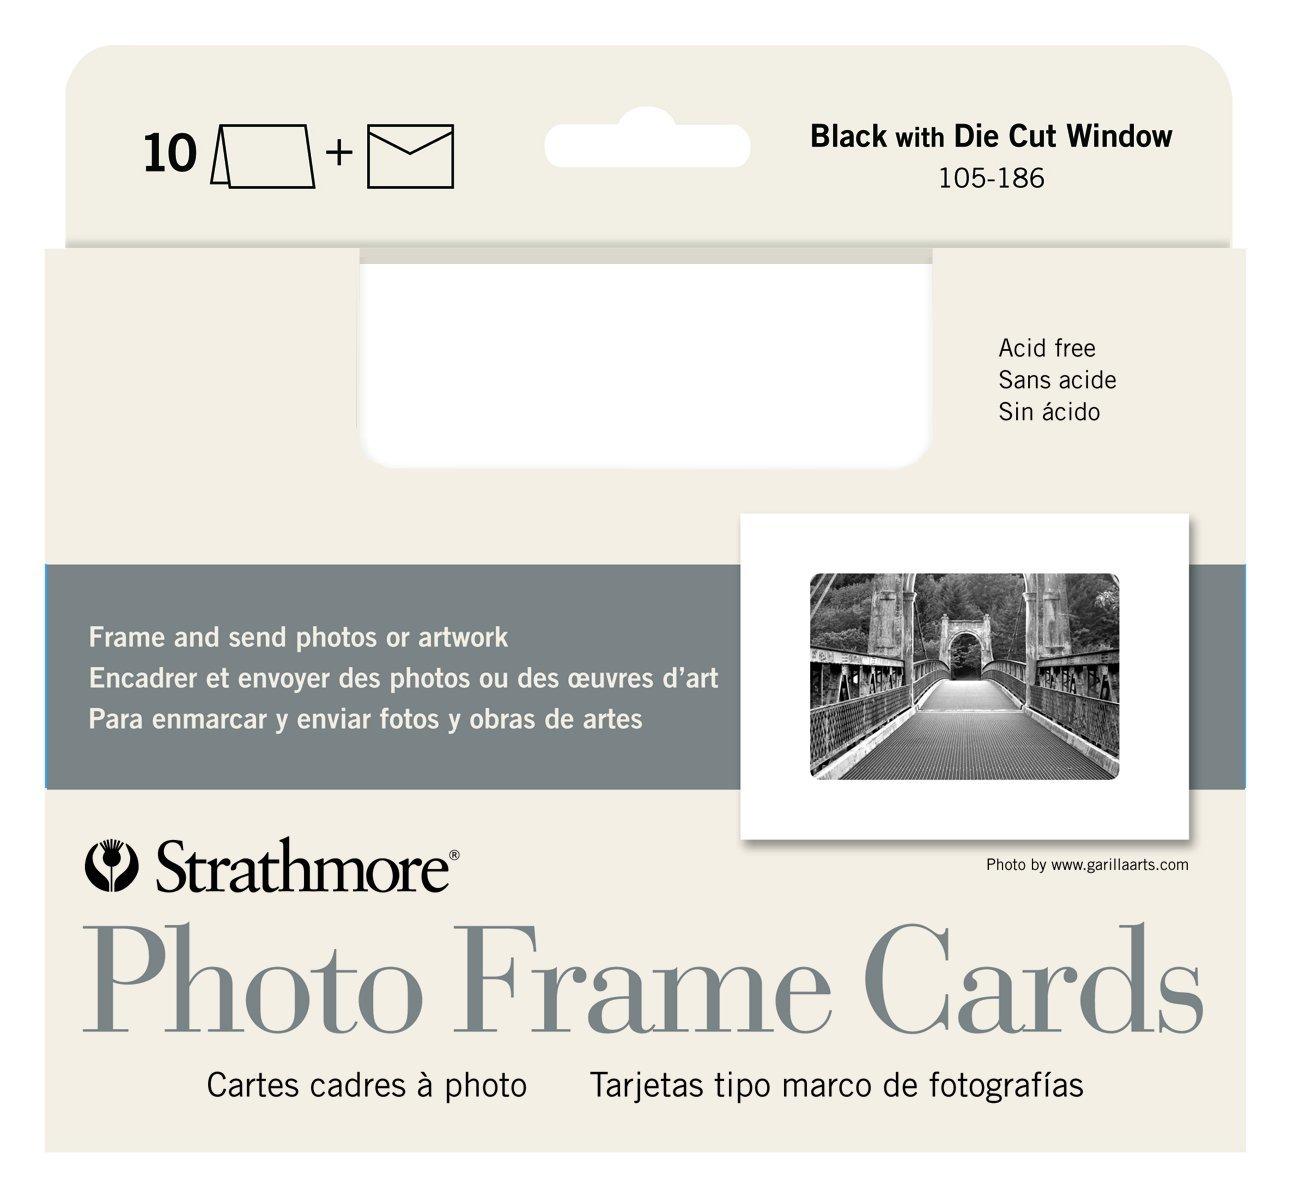 Strathmore Photo Frame Cards, White Cutout Window, 10 Cards & Envelopes